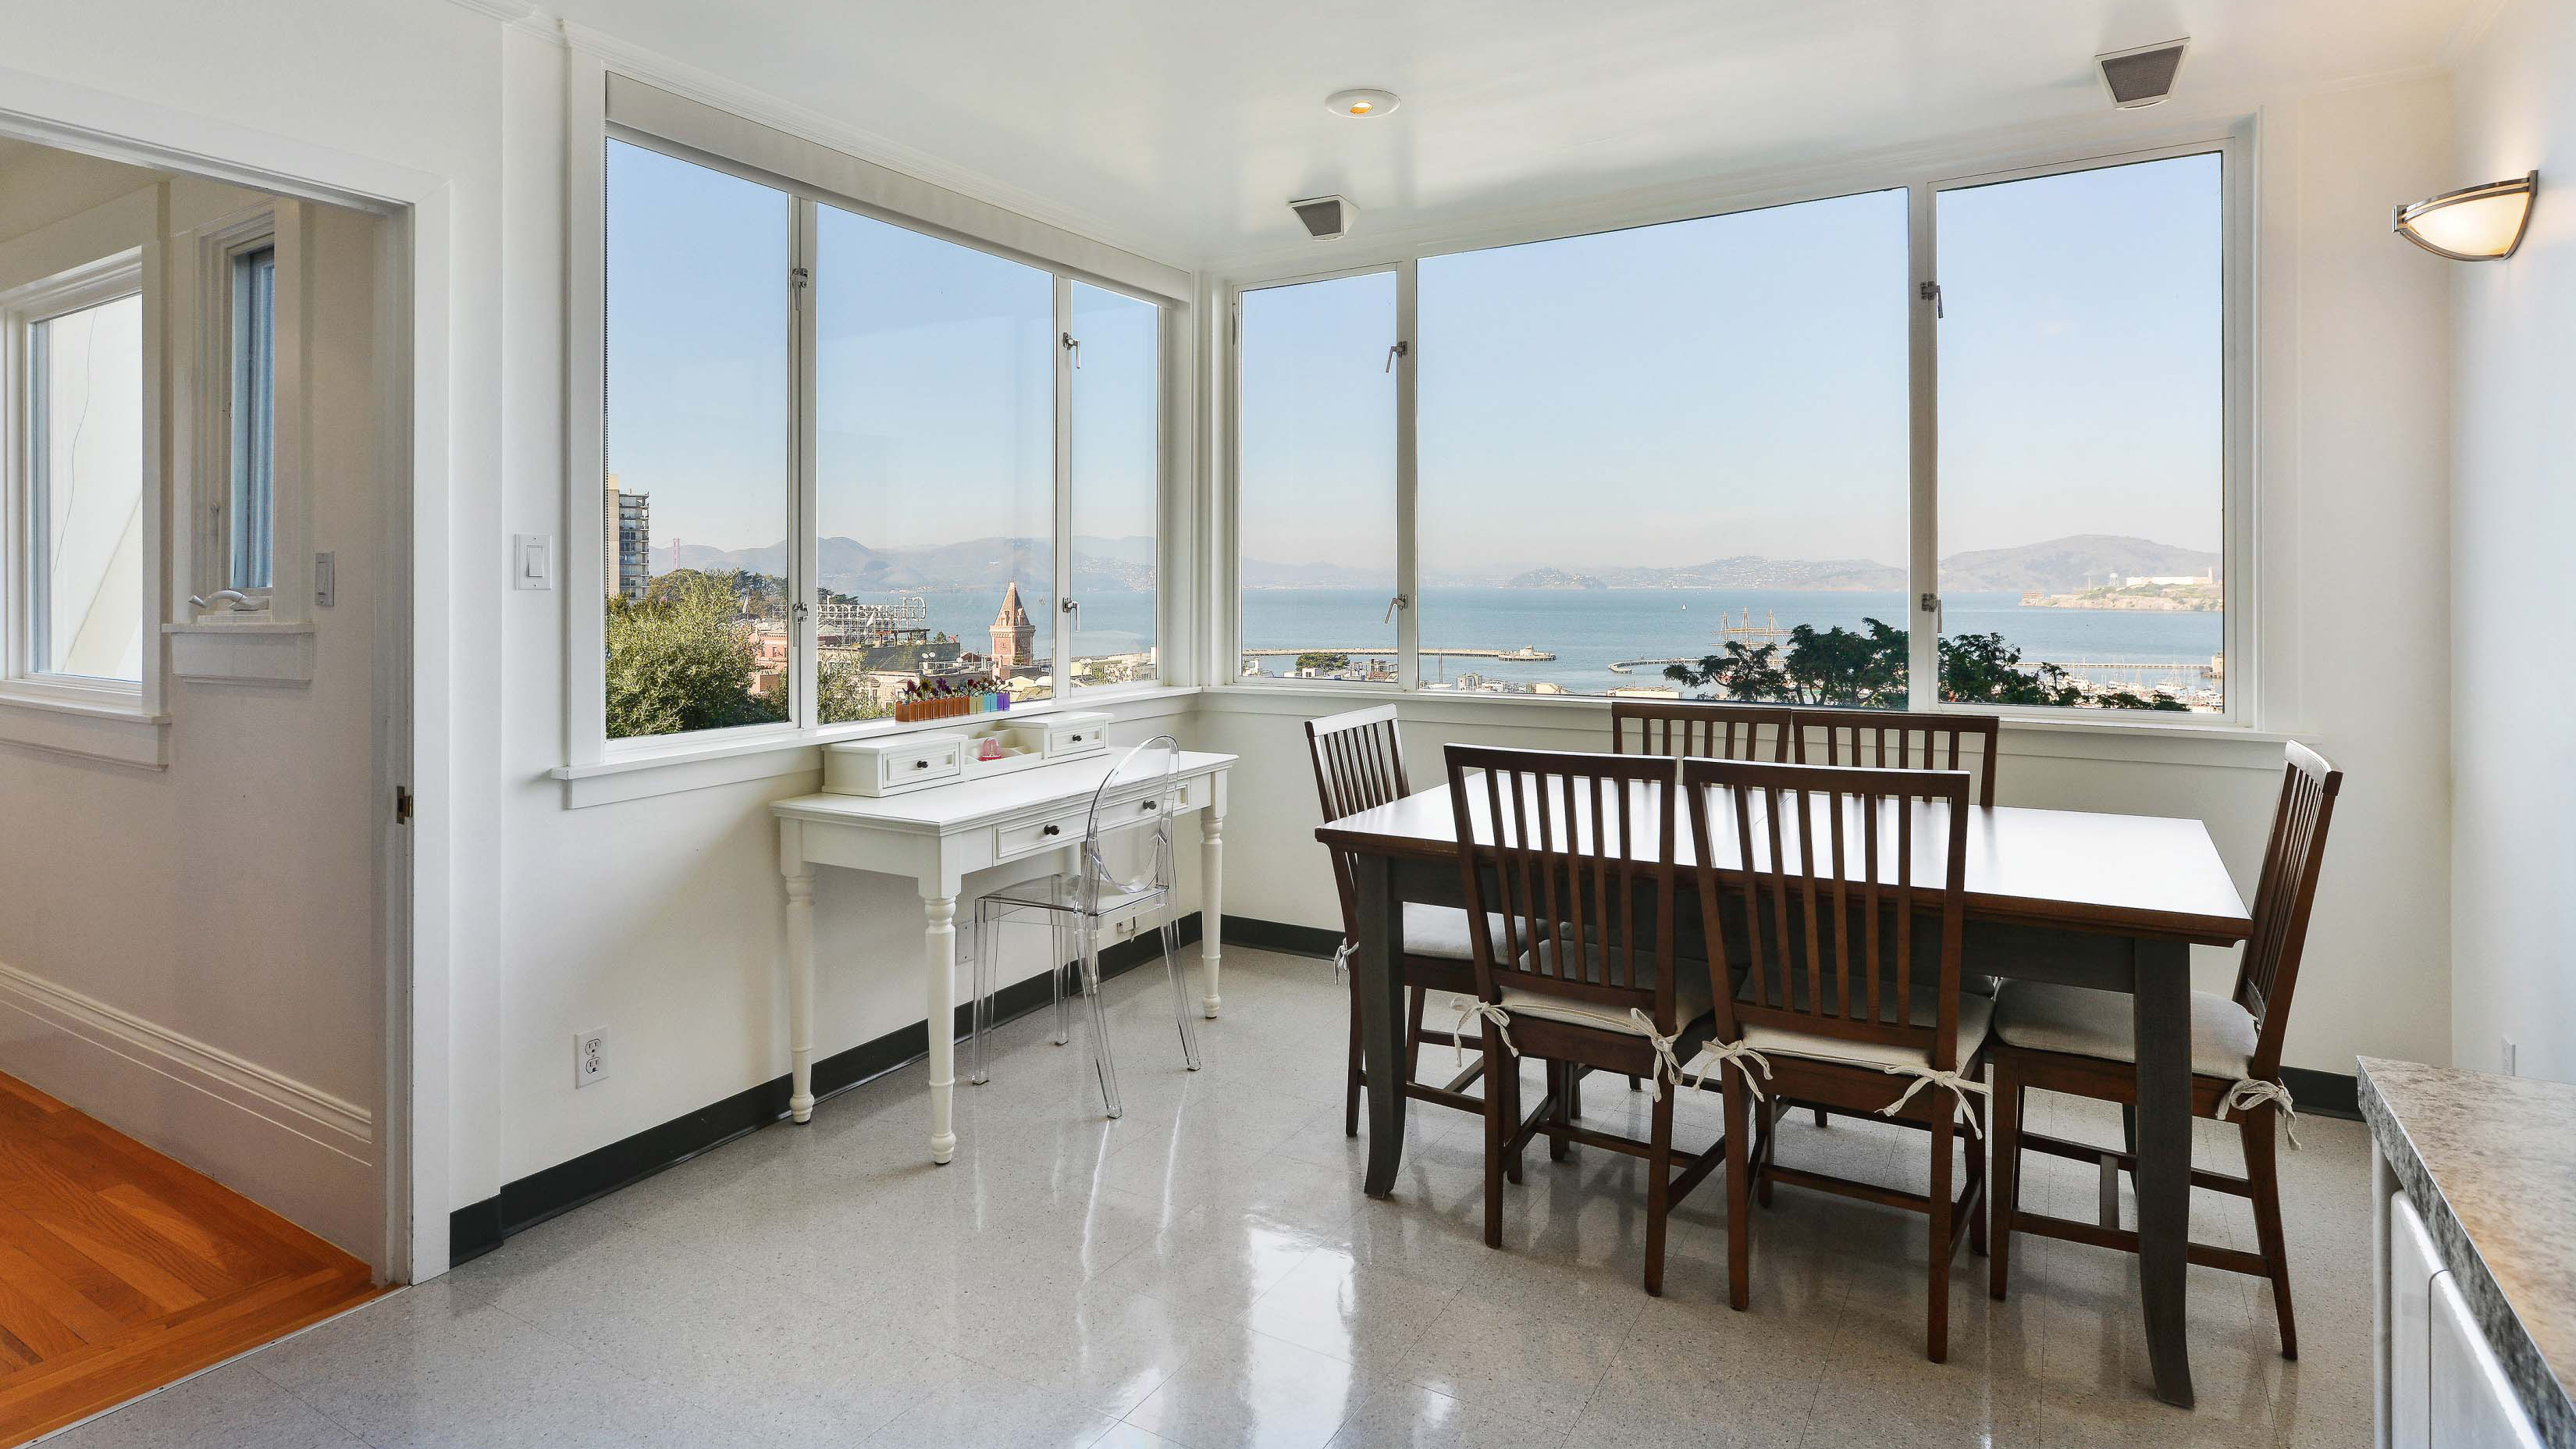 Each floor features breathtaking views of San Francisco Bay.